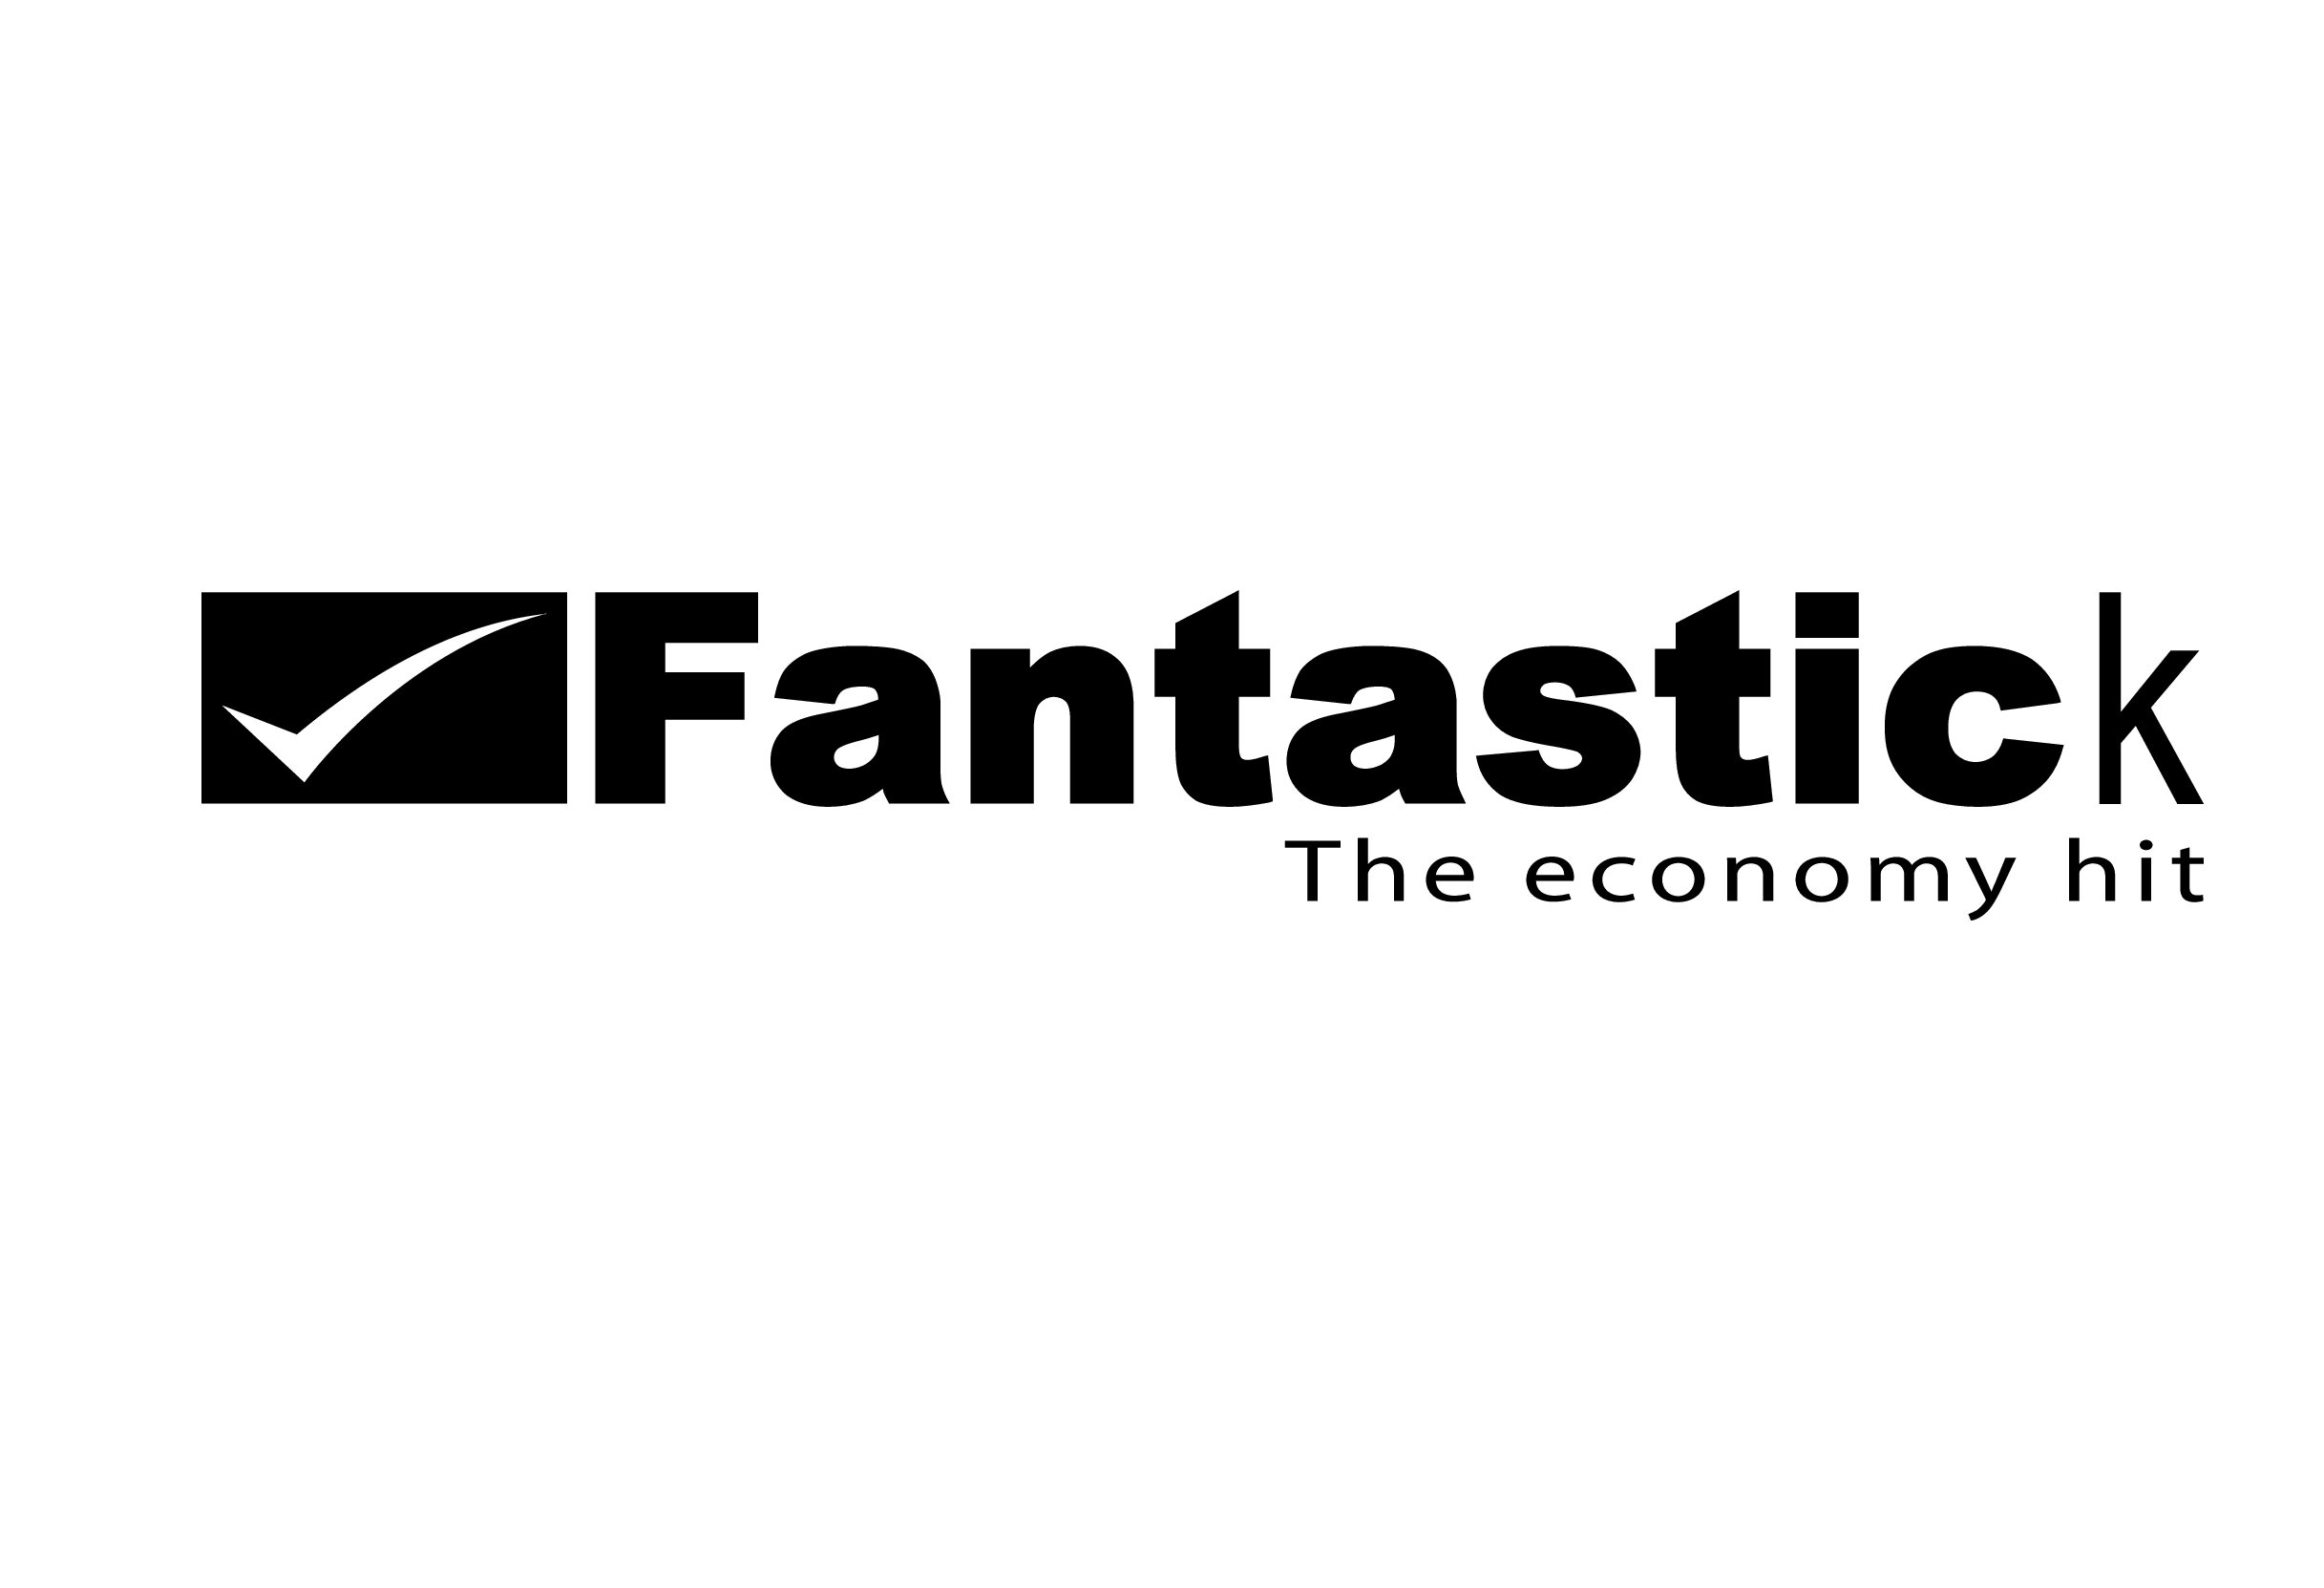 Fantastick by Balbex